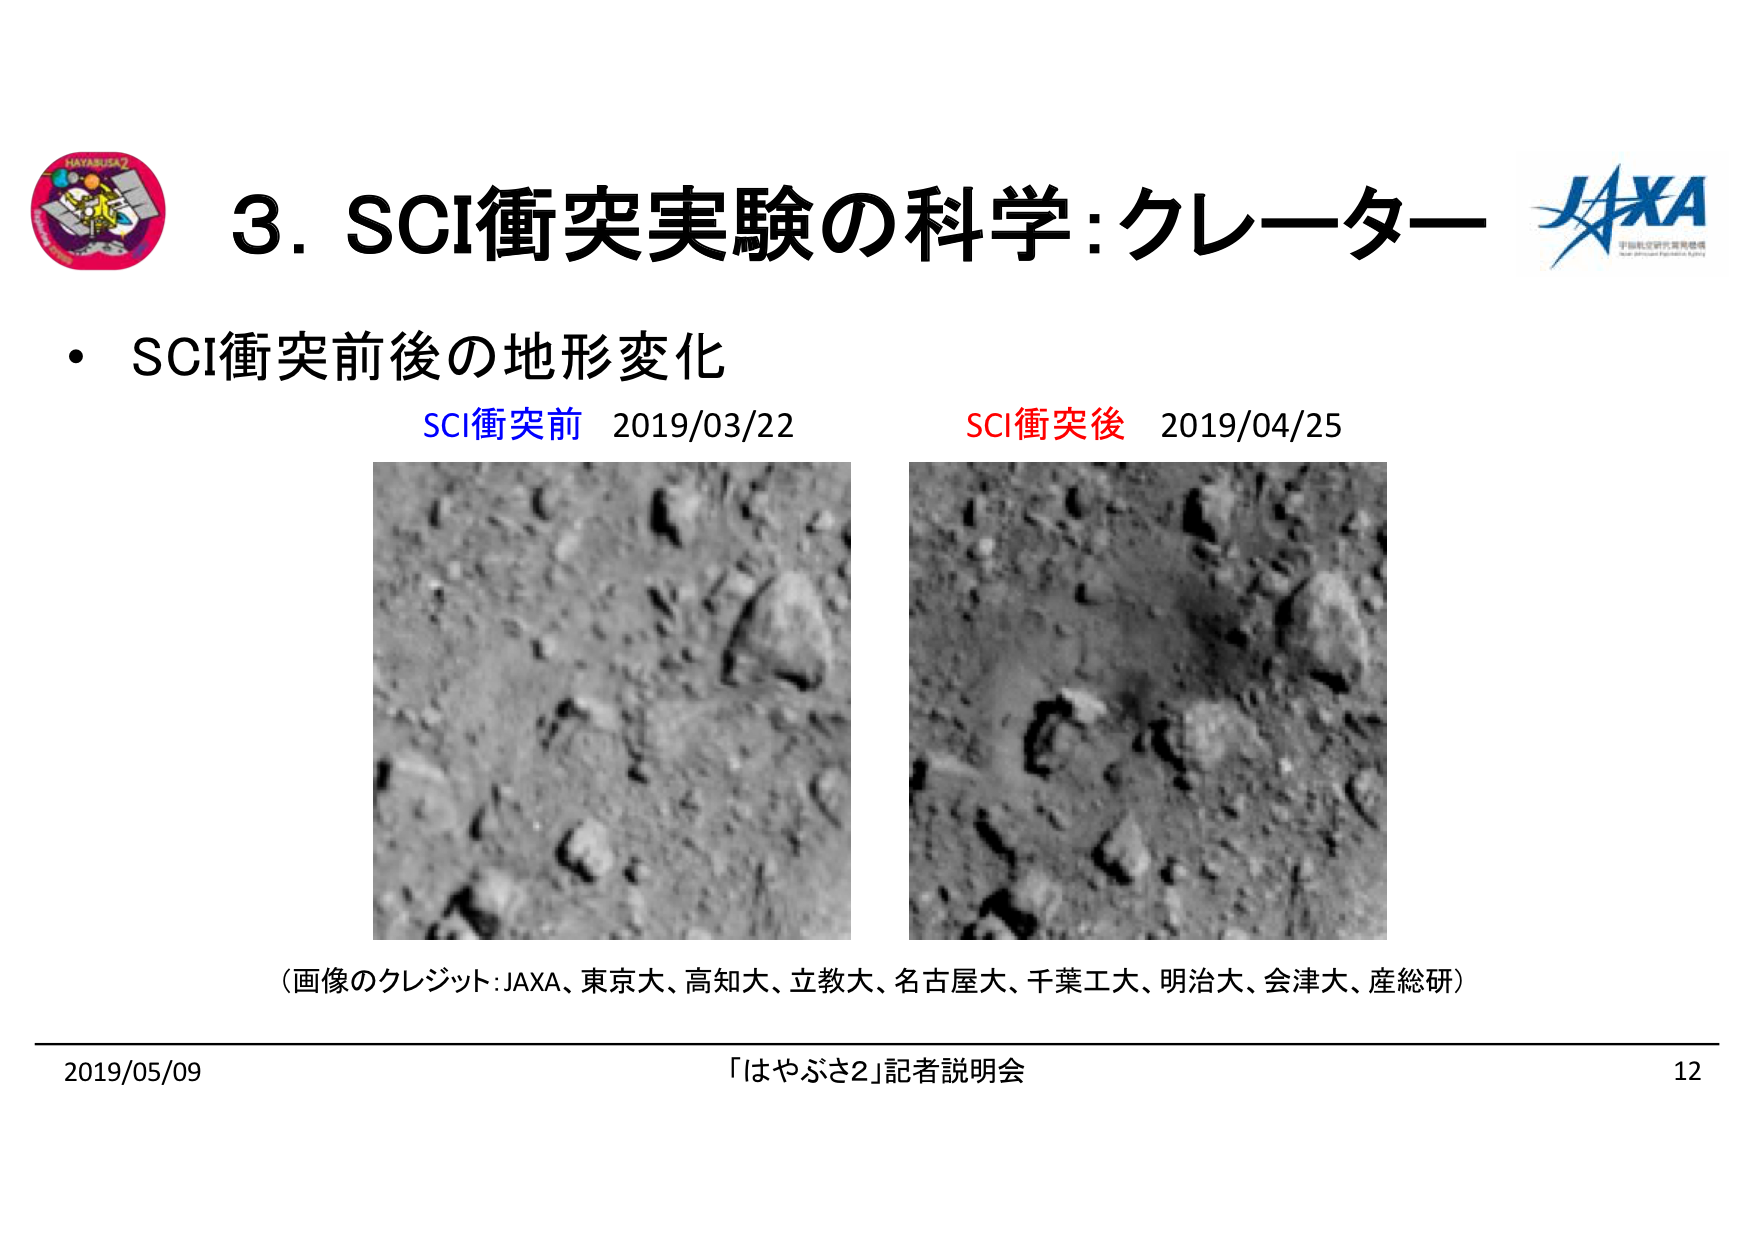 f:id:Imamura:20190509154408p:plain